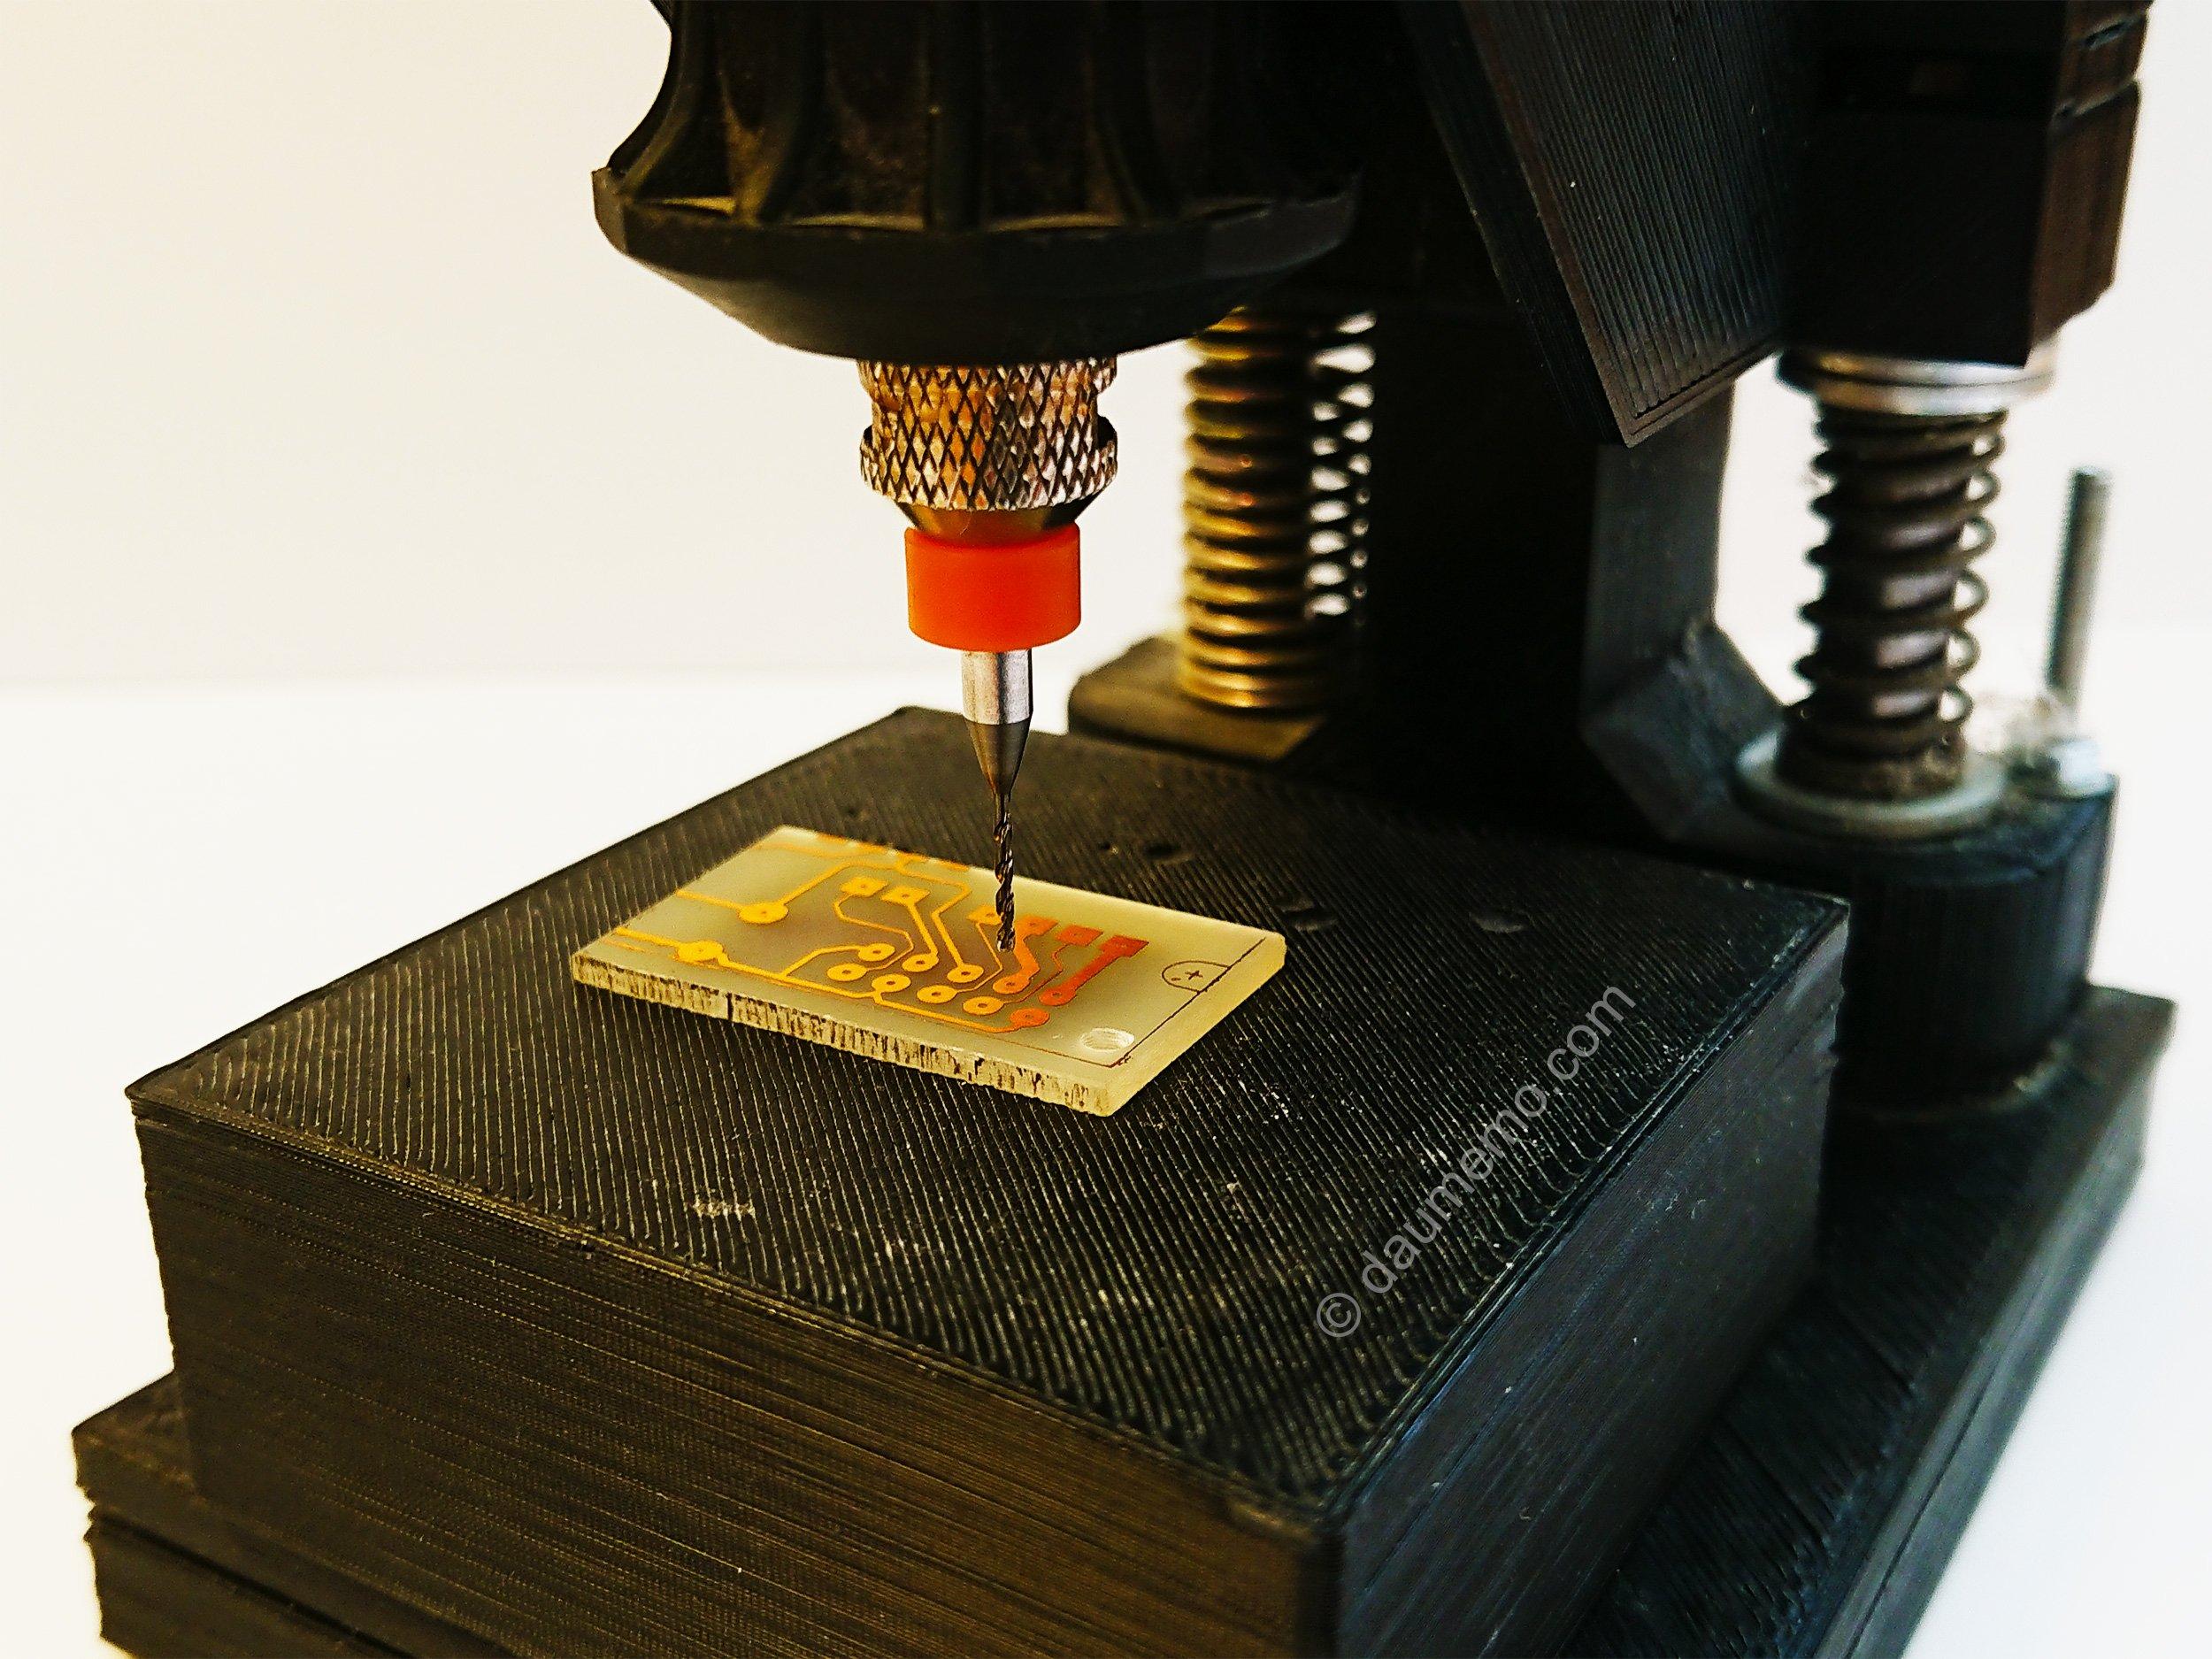 DIY drill press for a rotary tool (Dremel or similar)